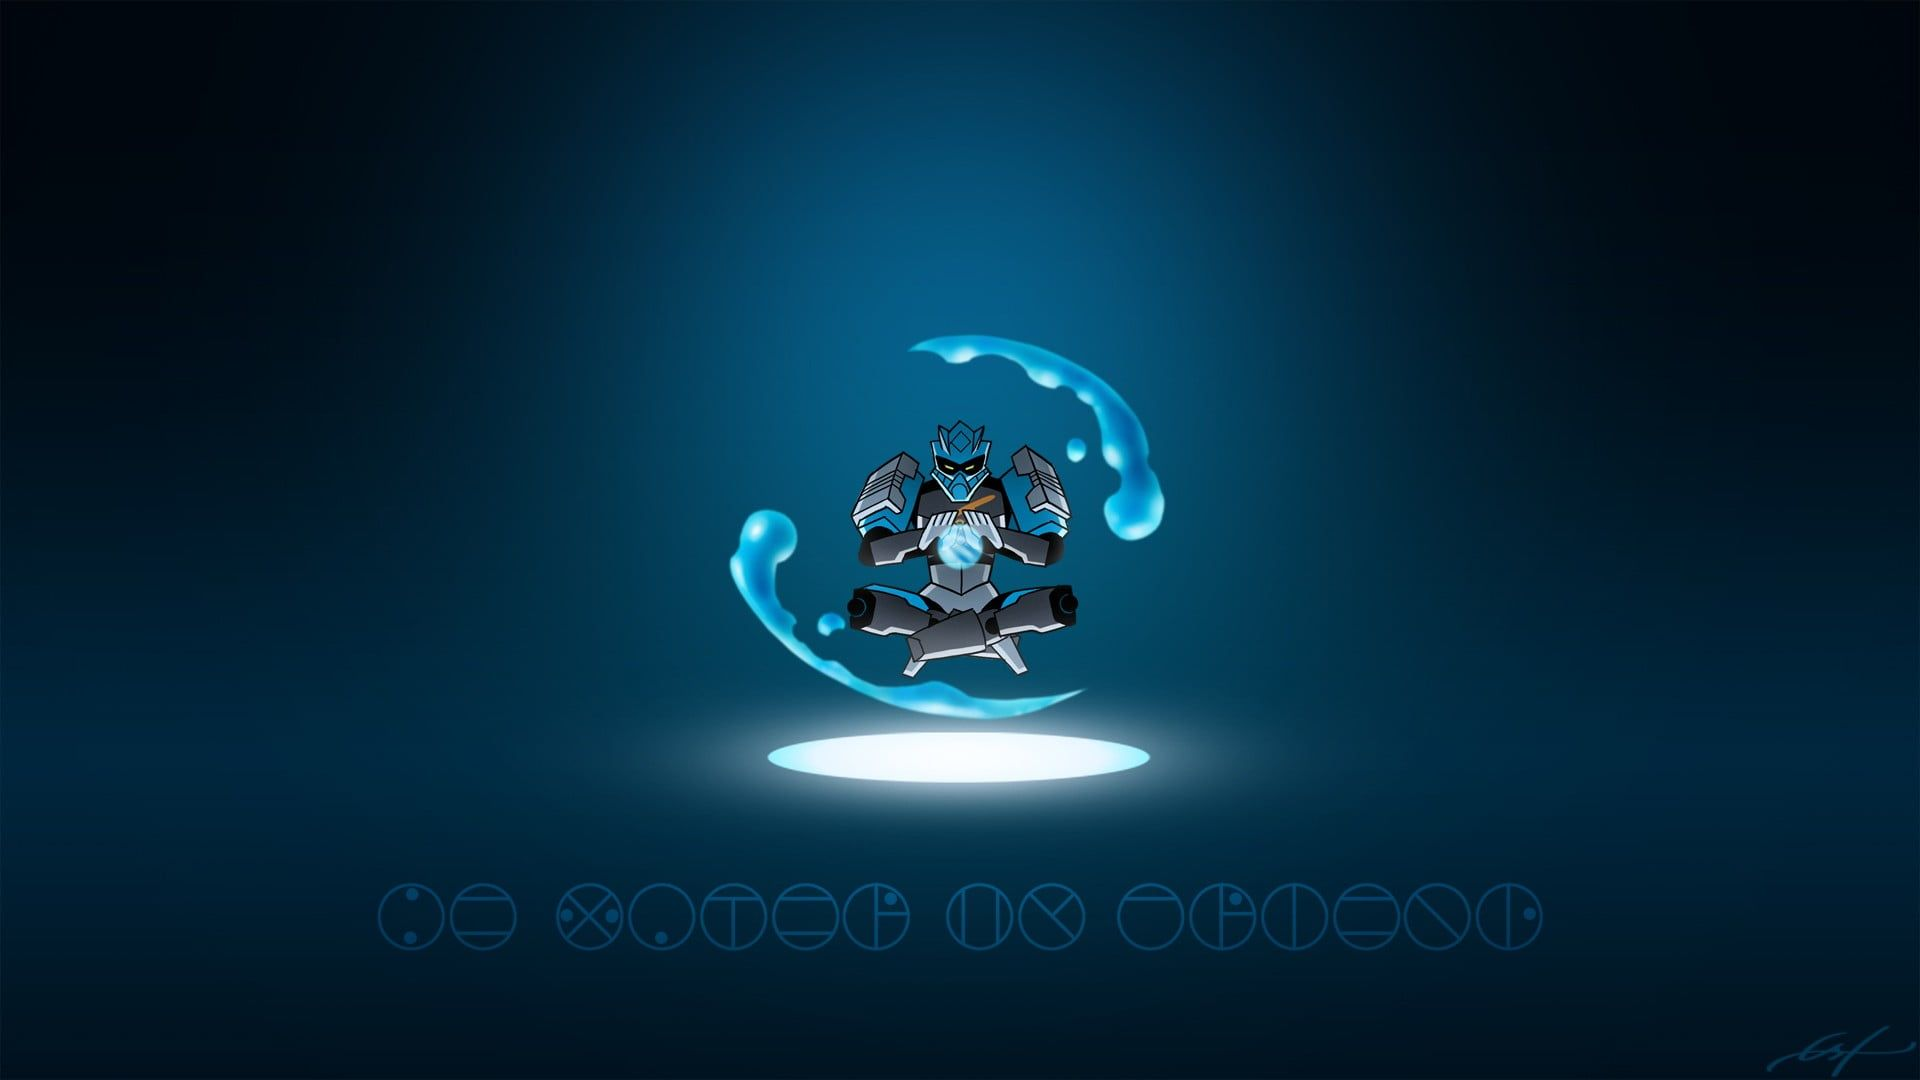 Bionicle #Toa #1080P #wallpaper #hdwallpaper #desktop